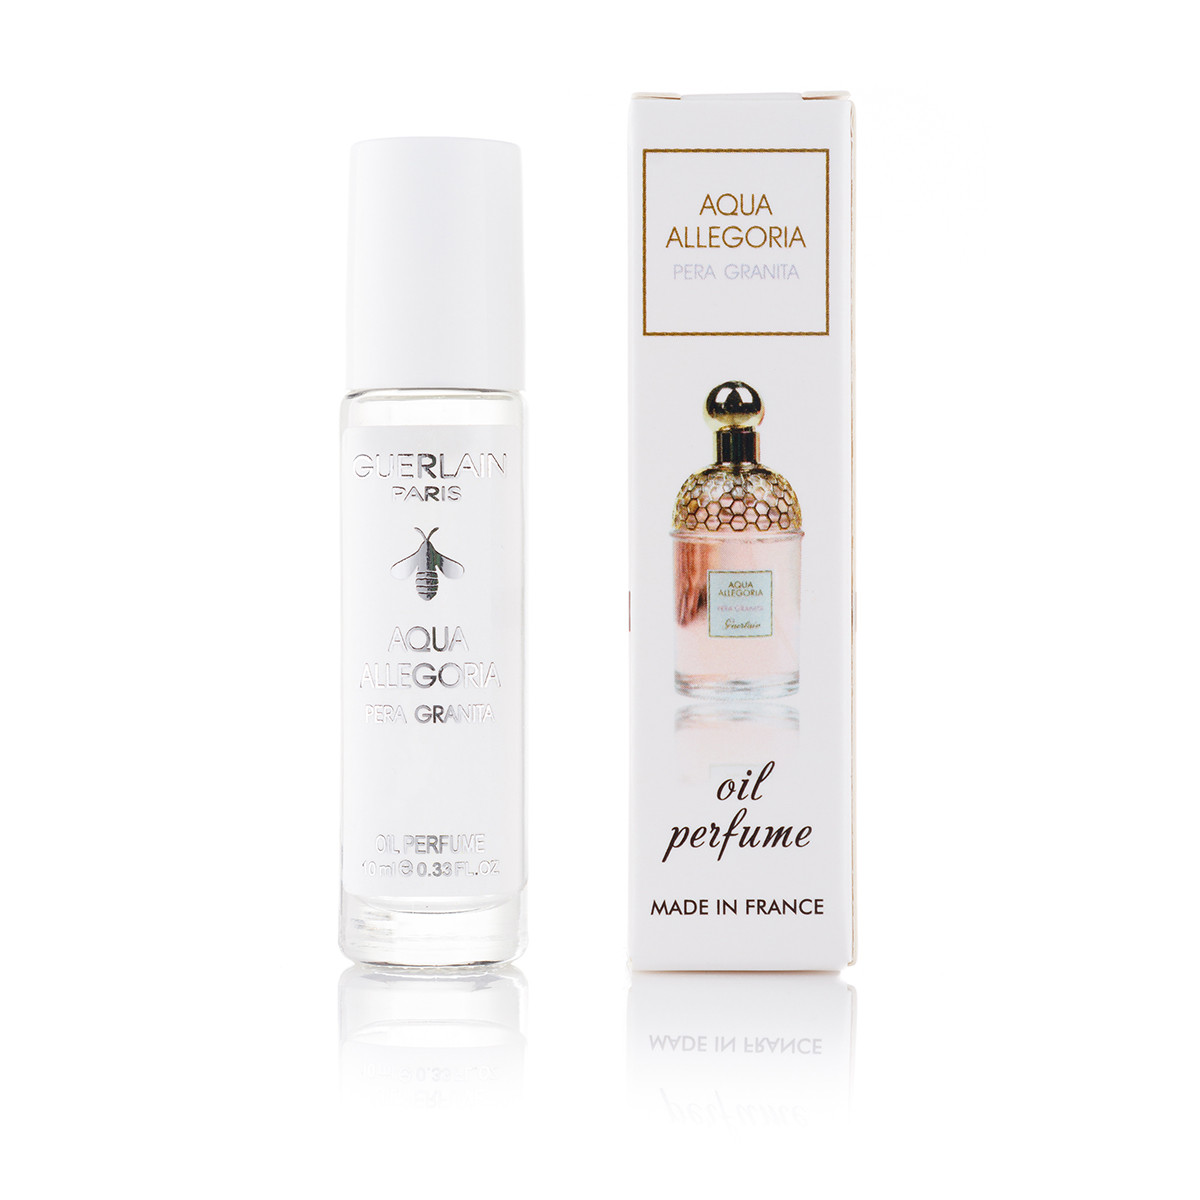 Масляный парфюм Guerlain Aqua Allegoria Pera Granita - 10 мл (шариковый) (ж)